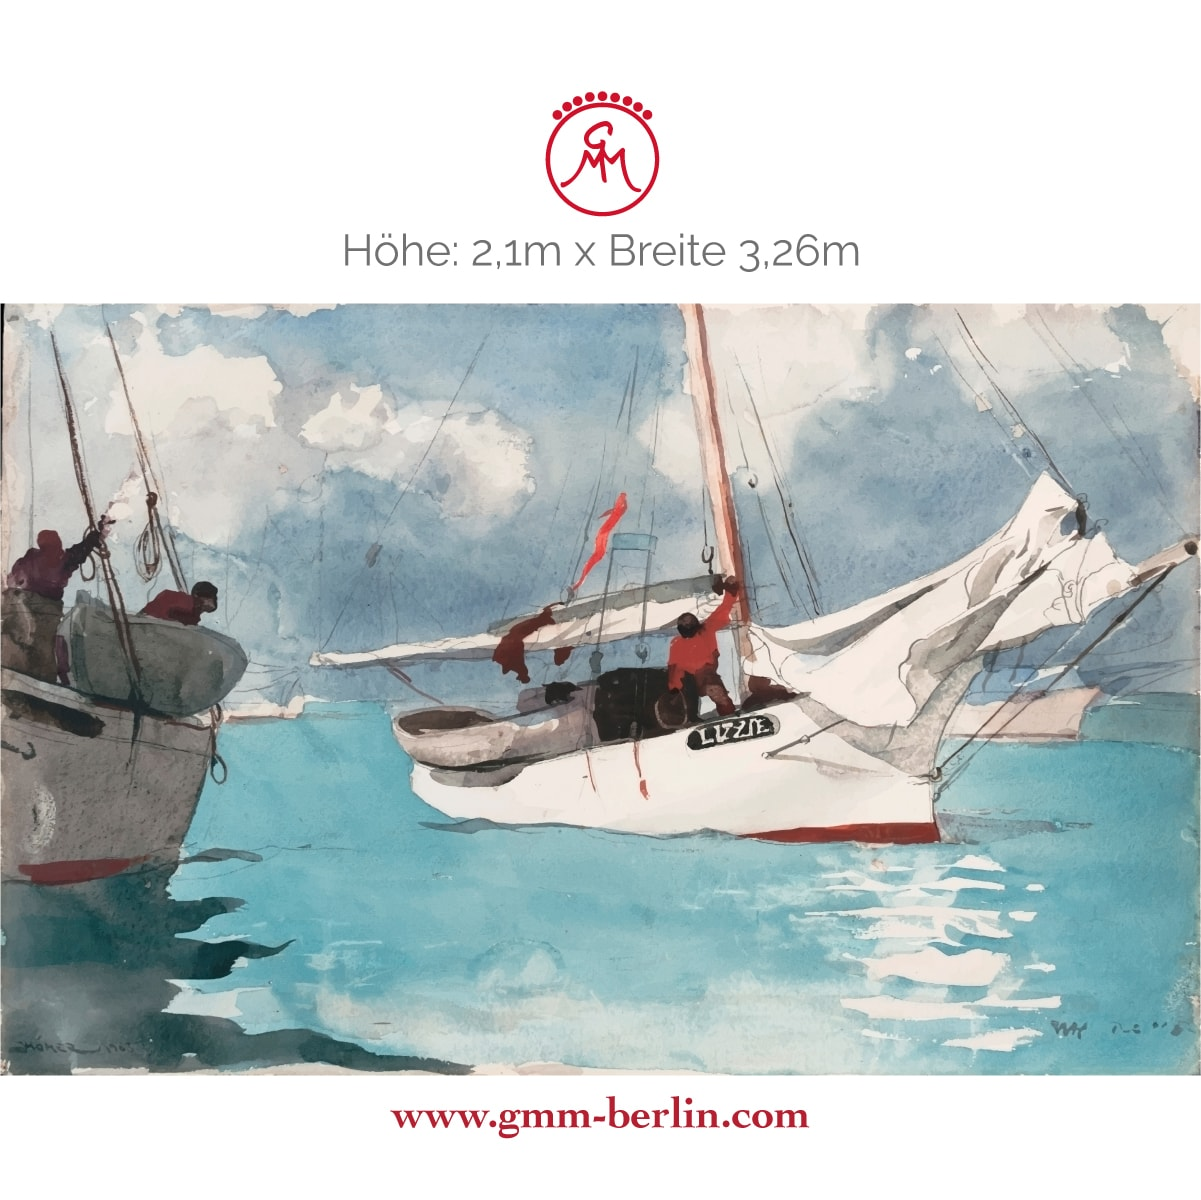 "Dekorative Panorama Tapete: Maritime Kunst Tapete ""Fischer Boote, Key West"" nach Winslow Homer"